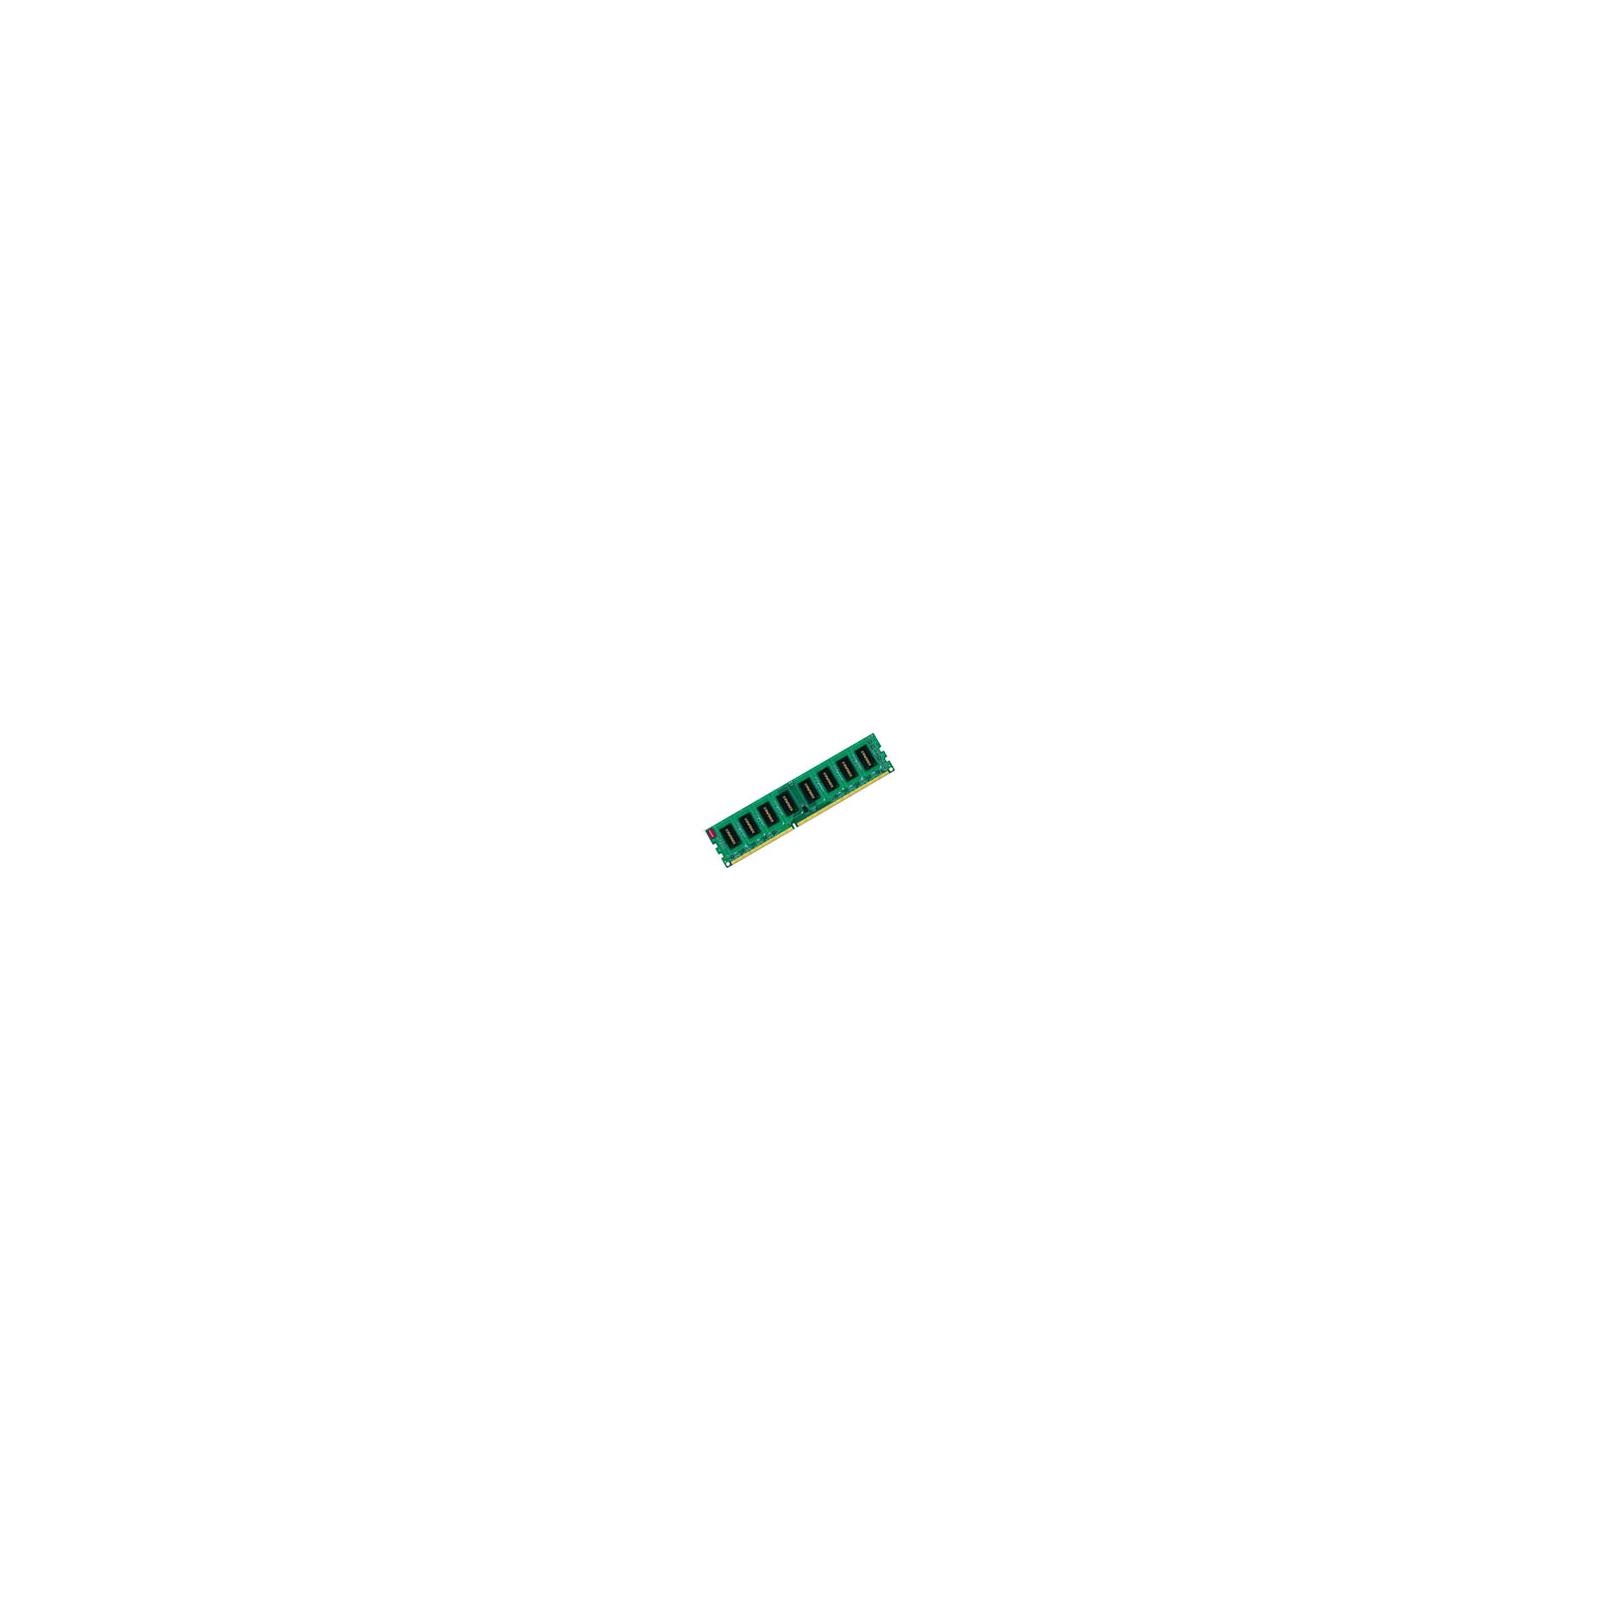 Модуль памяти для компьютера DDR3 2GB 1600 MHz Patriot (PSD32G16002H)